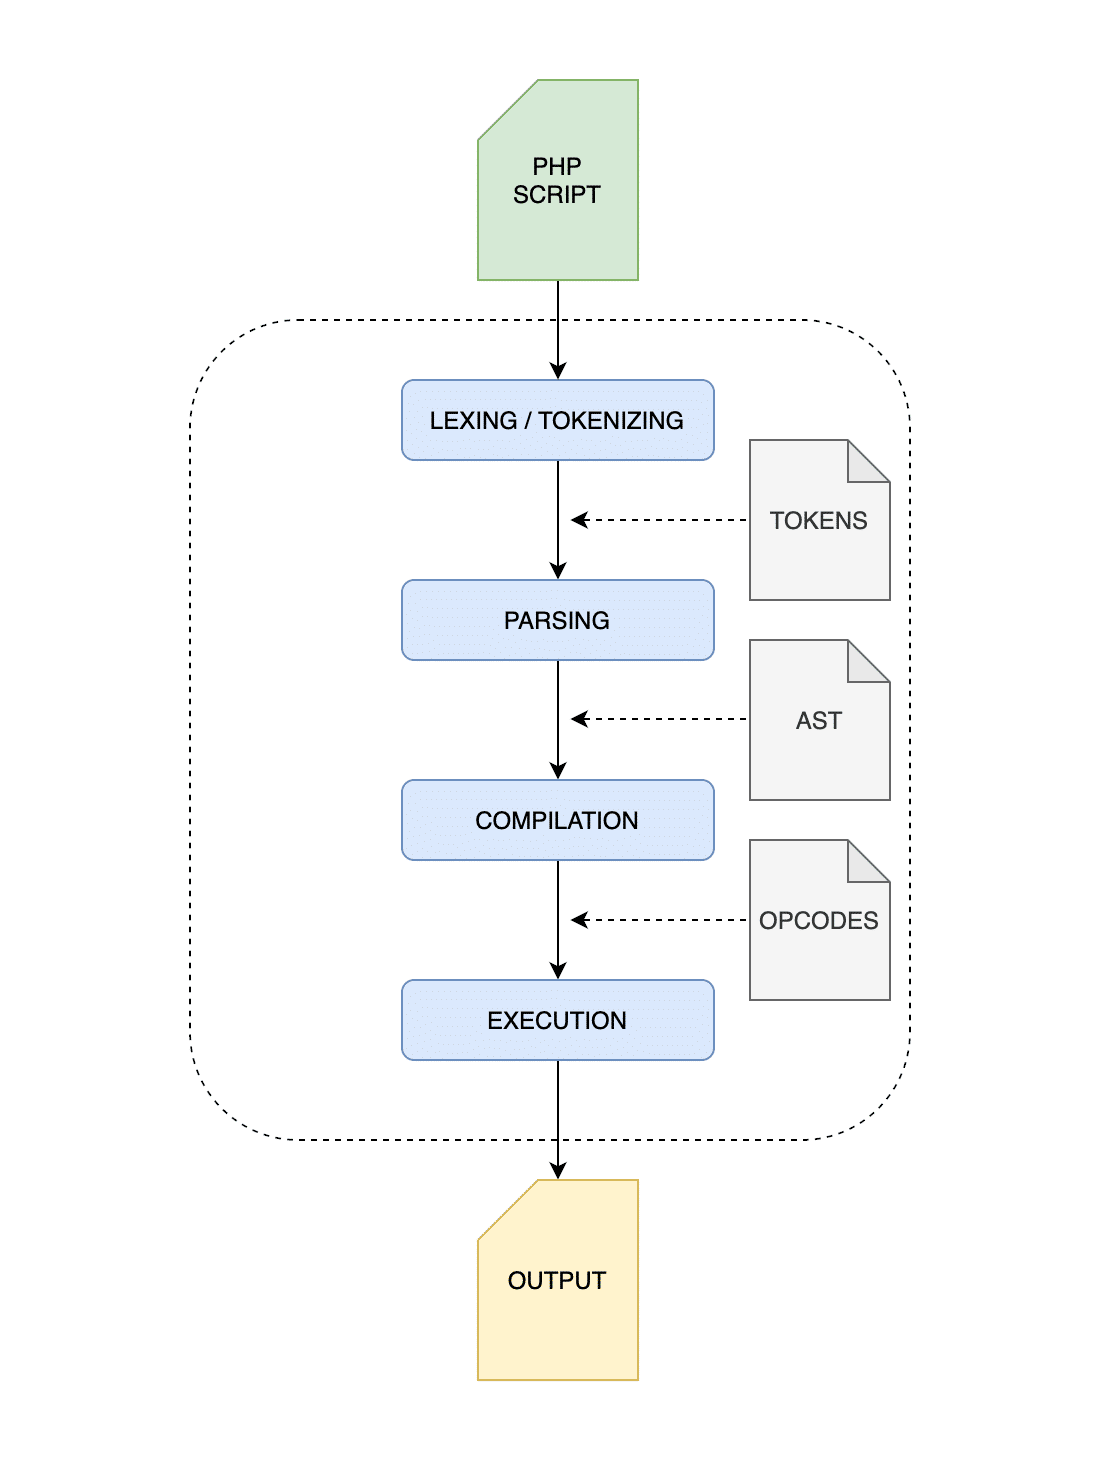 Grundläggande PHP-exekveringsprocess